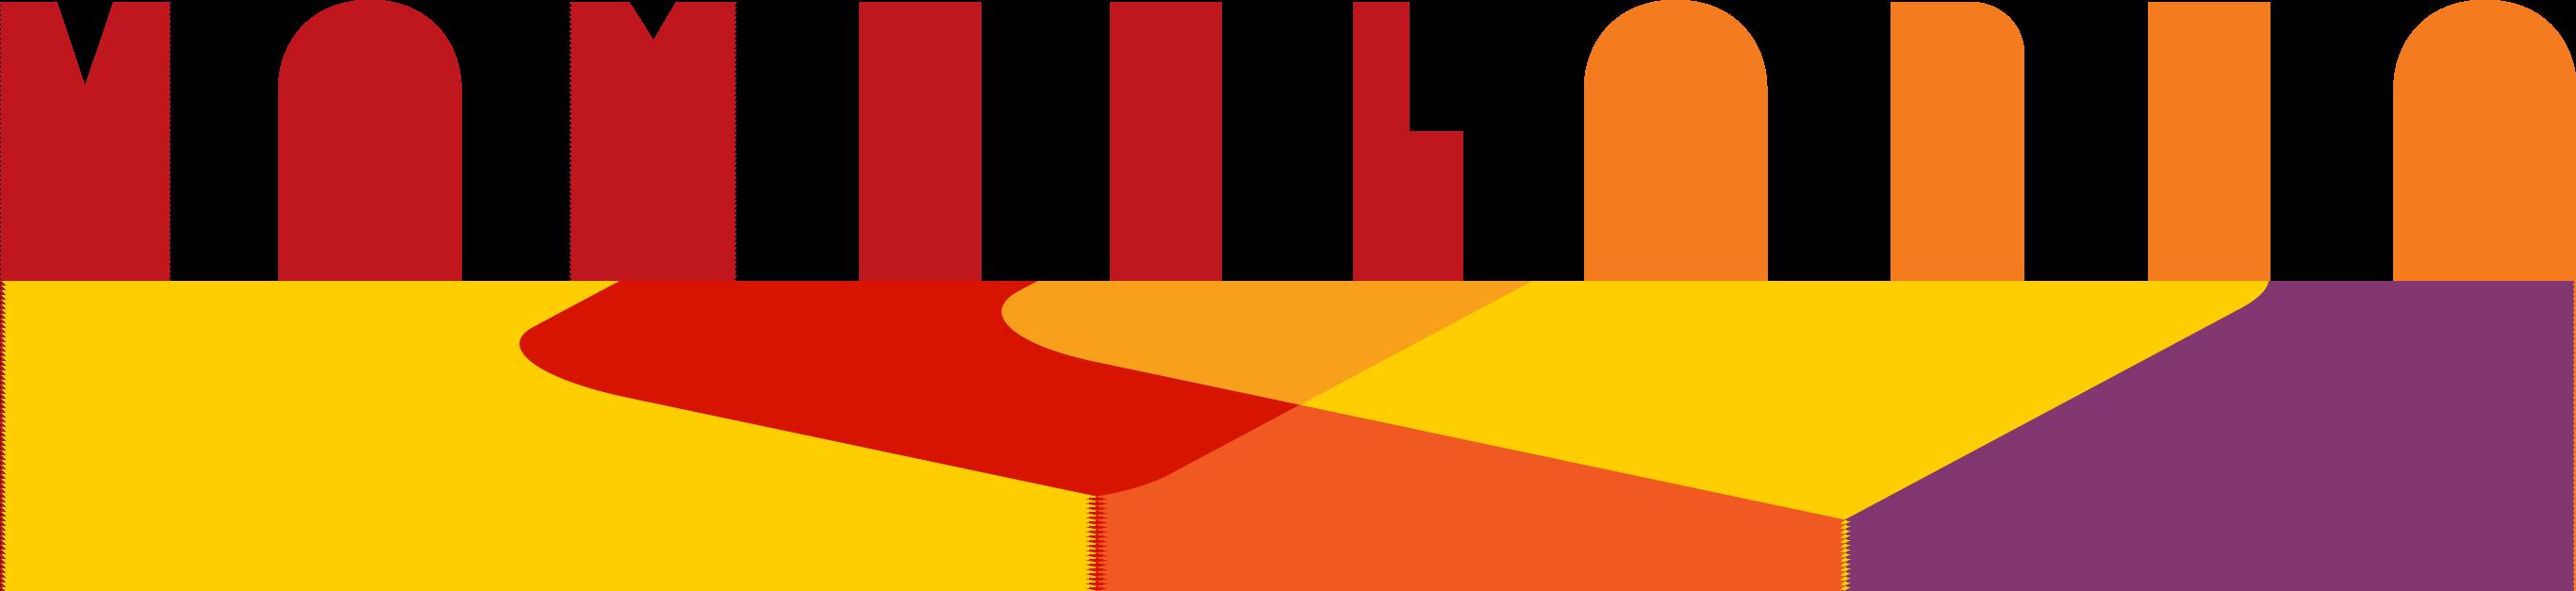 Voxtel, Inc. Logo